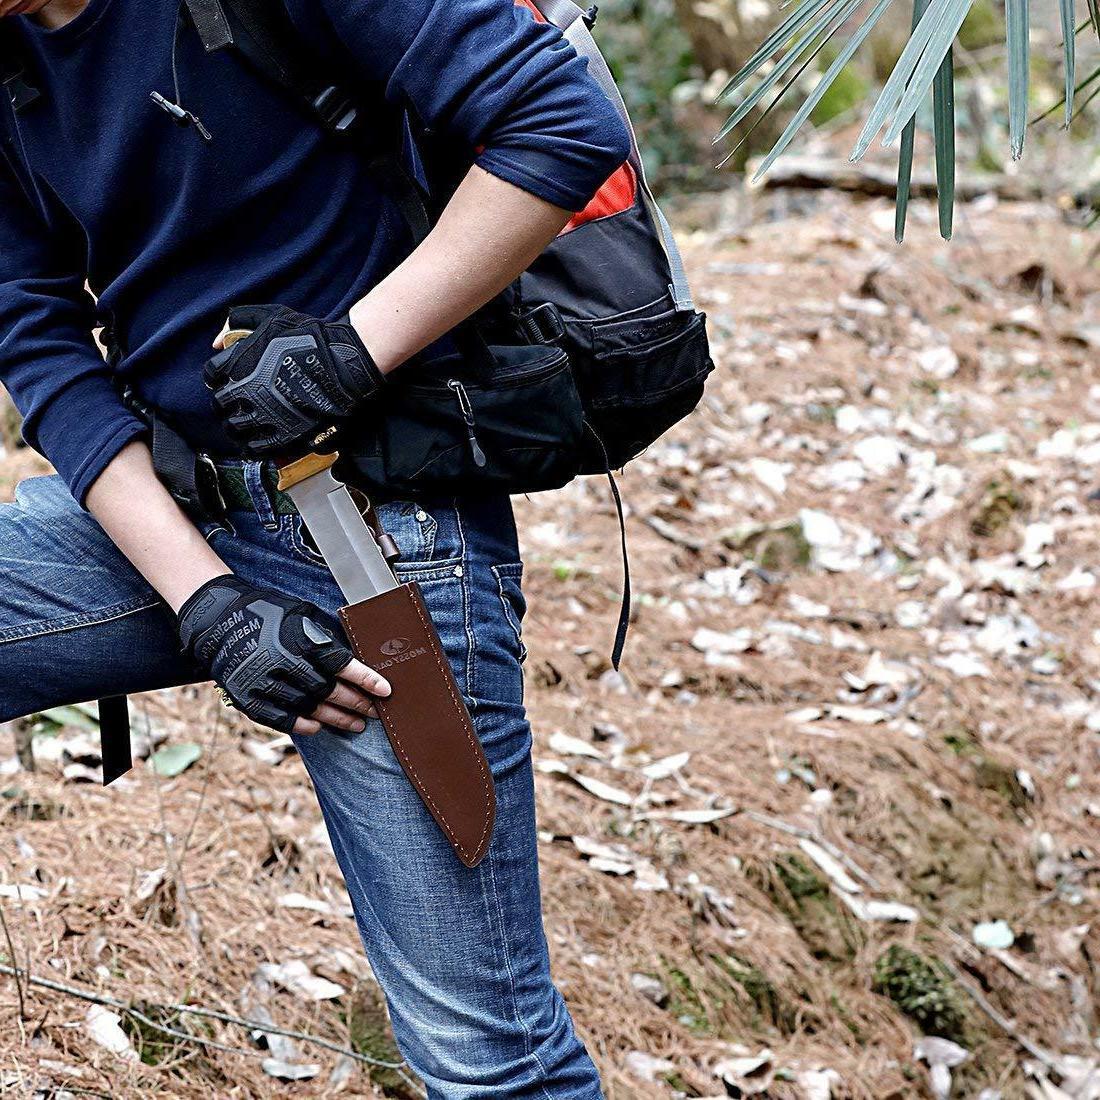 MOSSY OAK Knife Handle Leather